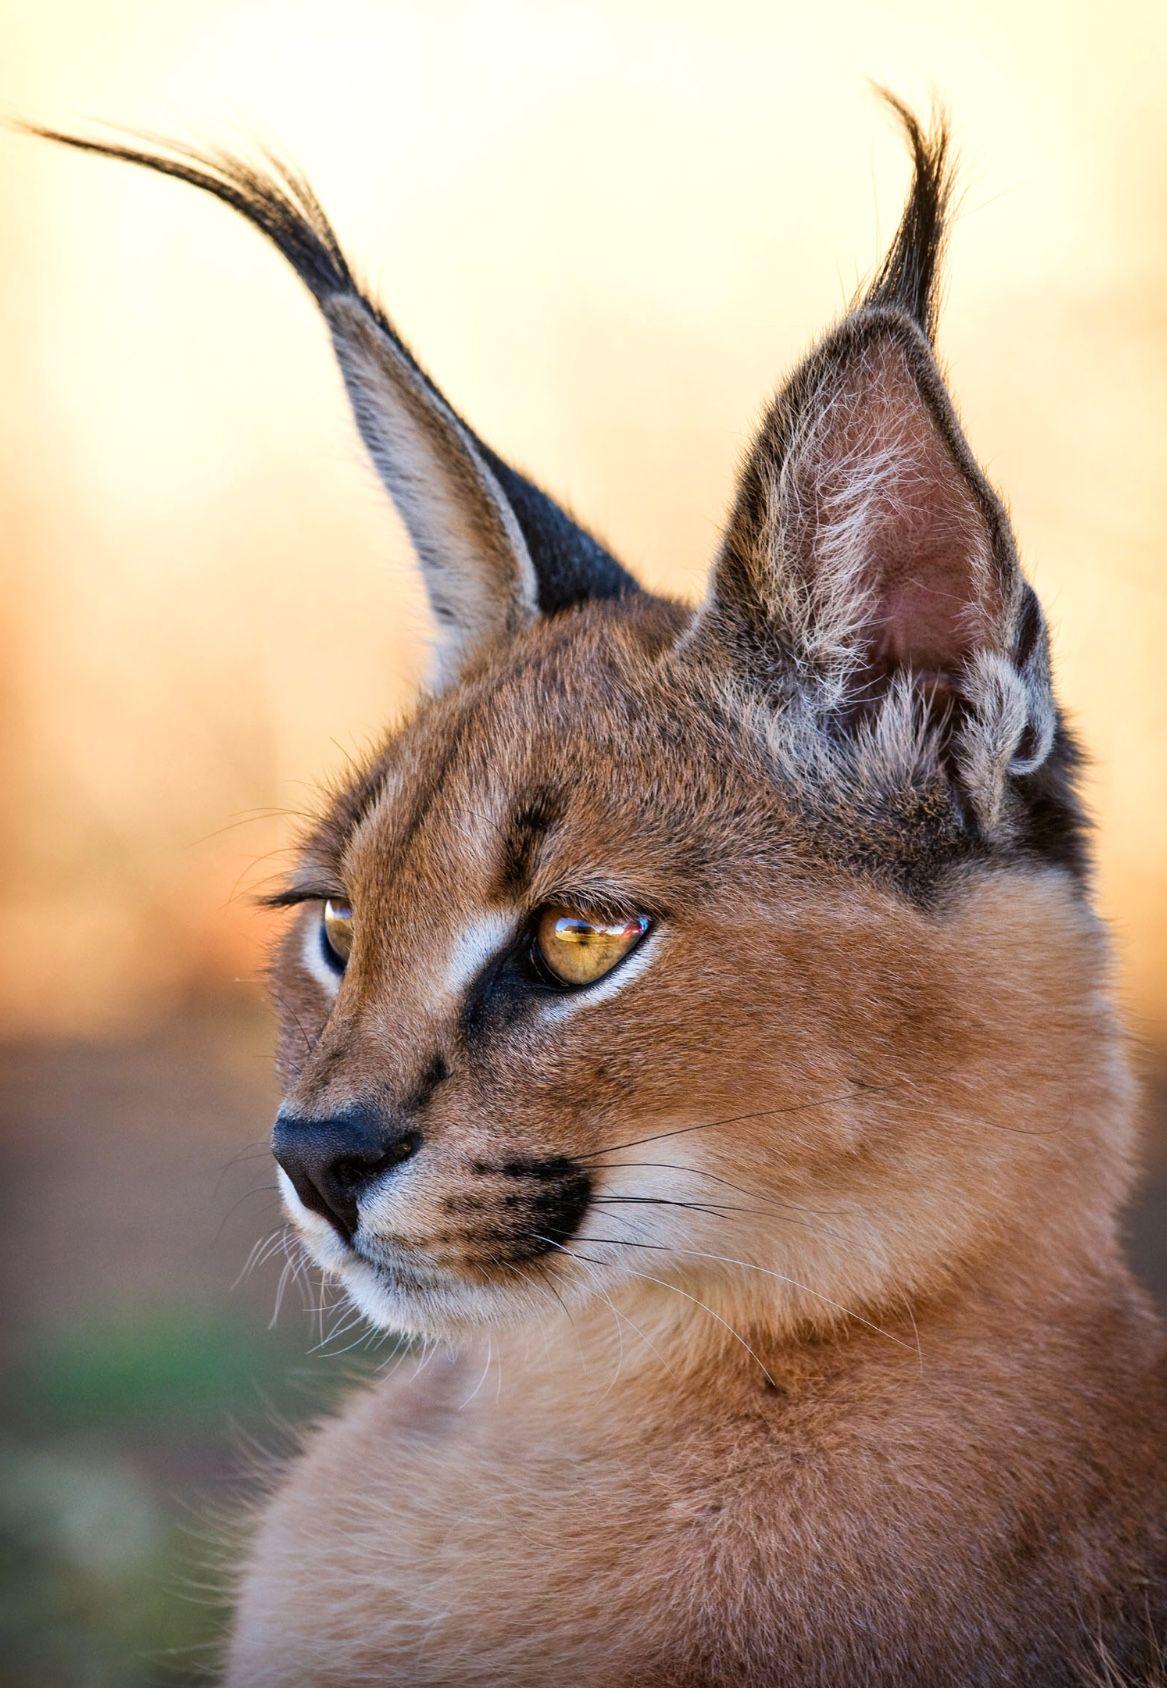 Portrait of a stunning caracal. Love those long black ear